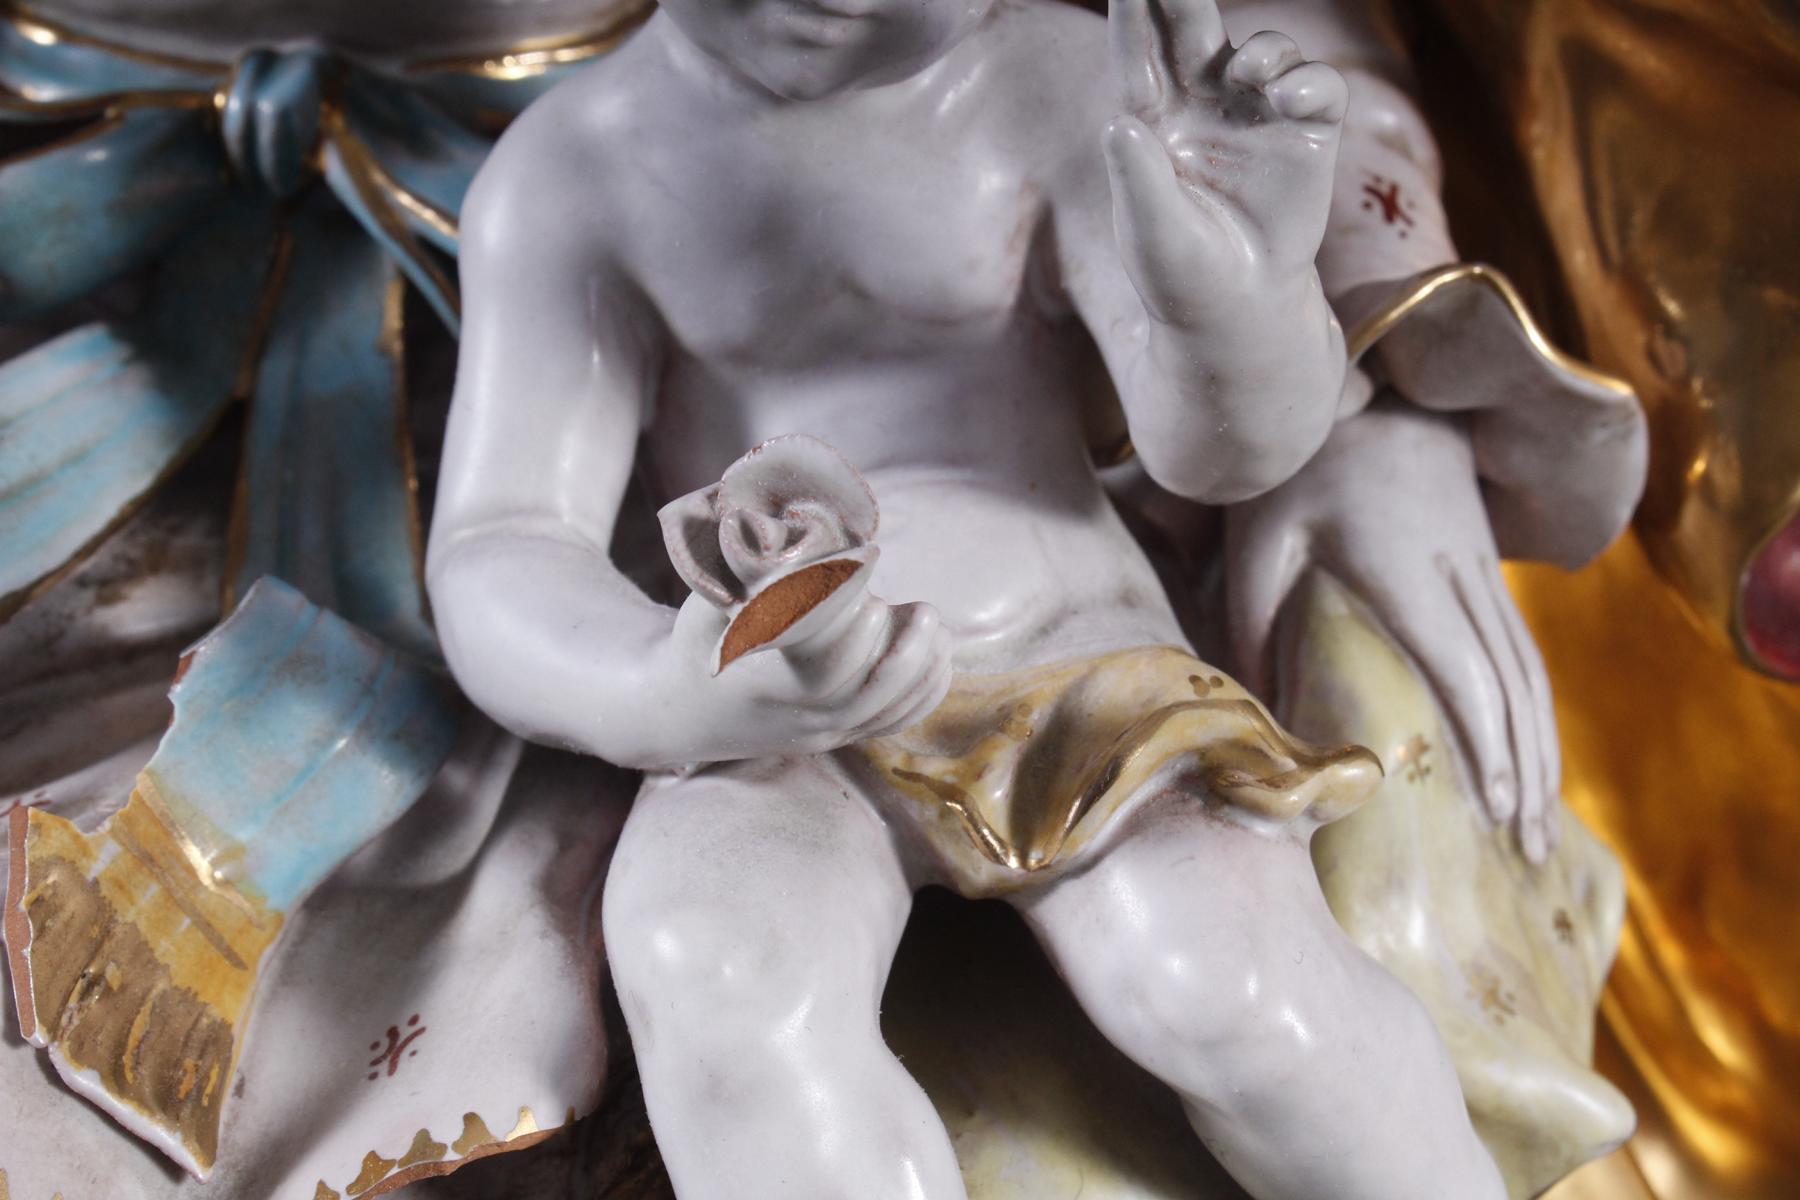 Keramik-Skulptur Madonna mit Kind, wohl Italien 2. Hälfte 20. Jh.-2